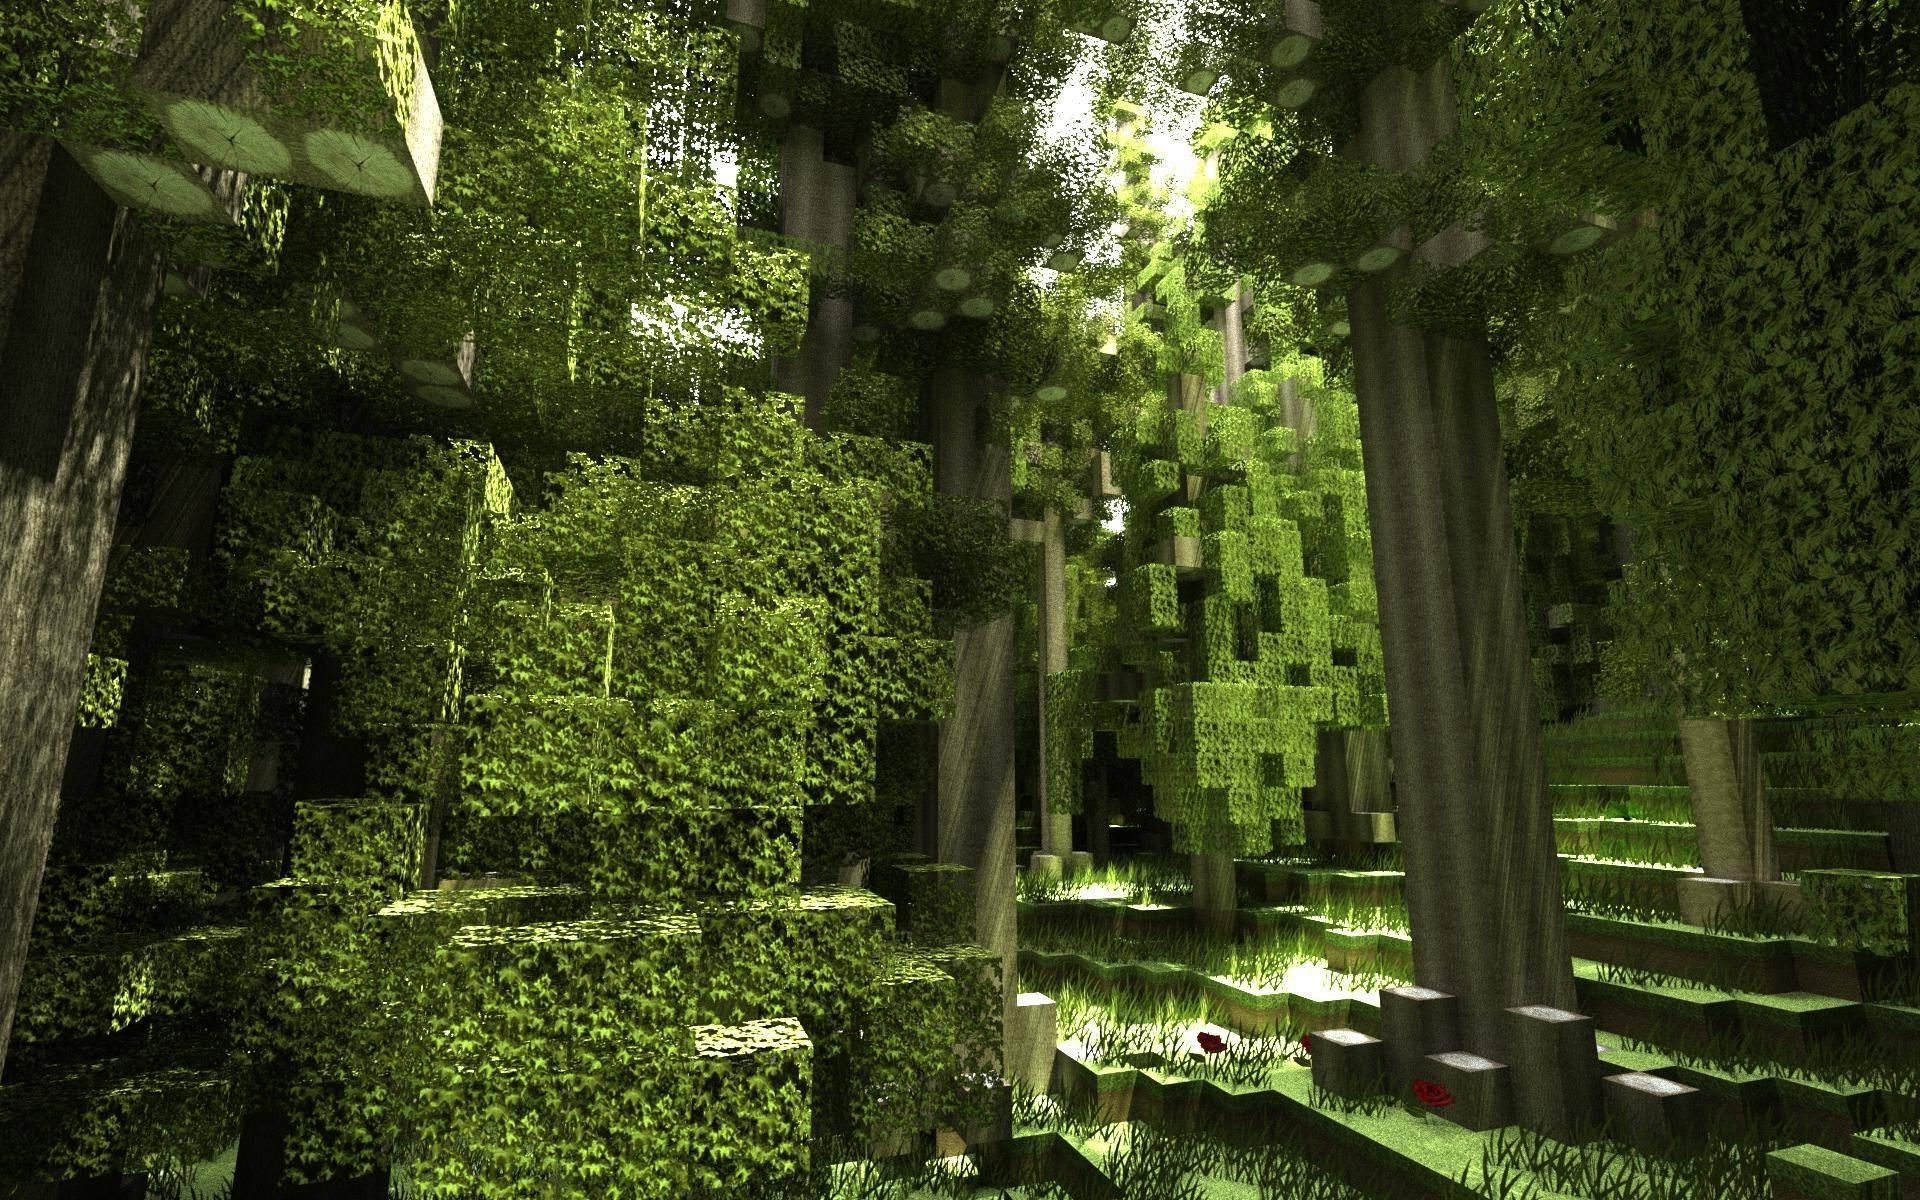 Wonderful Wallpaper Minecraft Forest - sunlight-forest-garden-nature-render-park-Minecraft-green-jungle-rainforest-backyard-tree-leaf-flower-plant-1920x1200-px-woodland-habitat-natural-environment-botany-woody-plant-ecosystem-biome-shrub-screenshots-567908  2018_139337.jpg